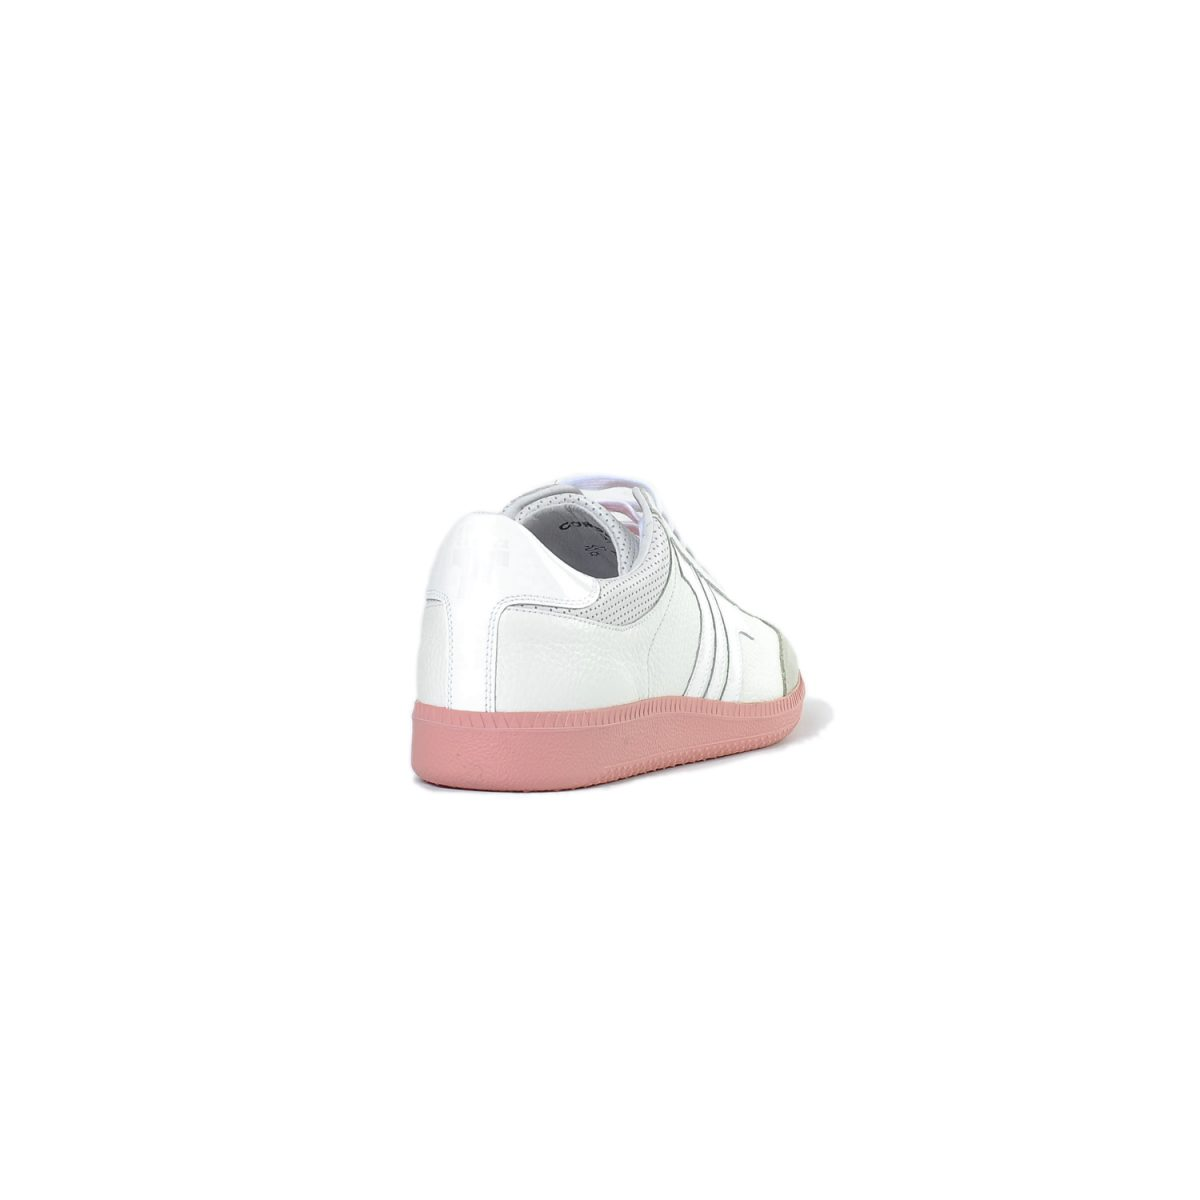 Tisza shoes - Compakt - White-nude